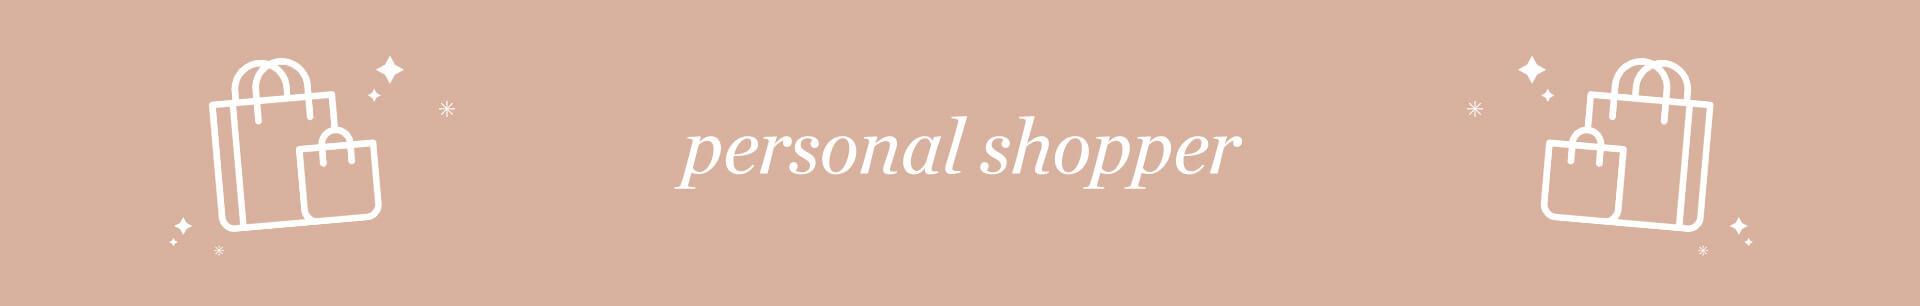 Fillity_Personal-Shopper_desk_1